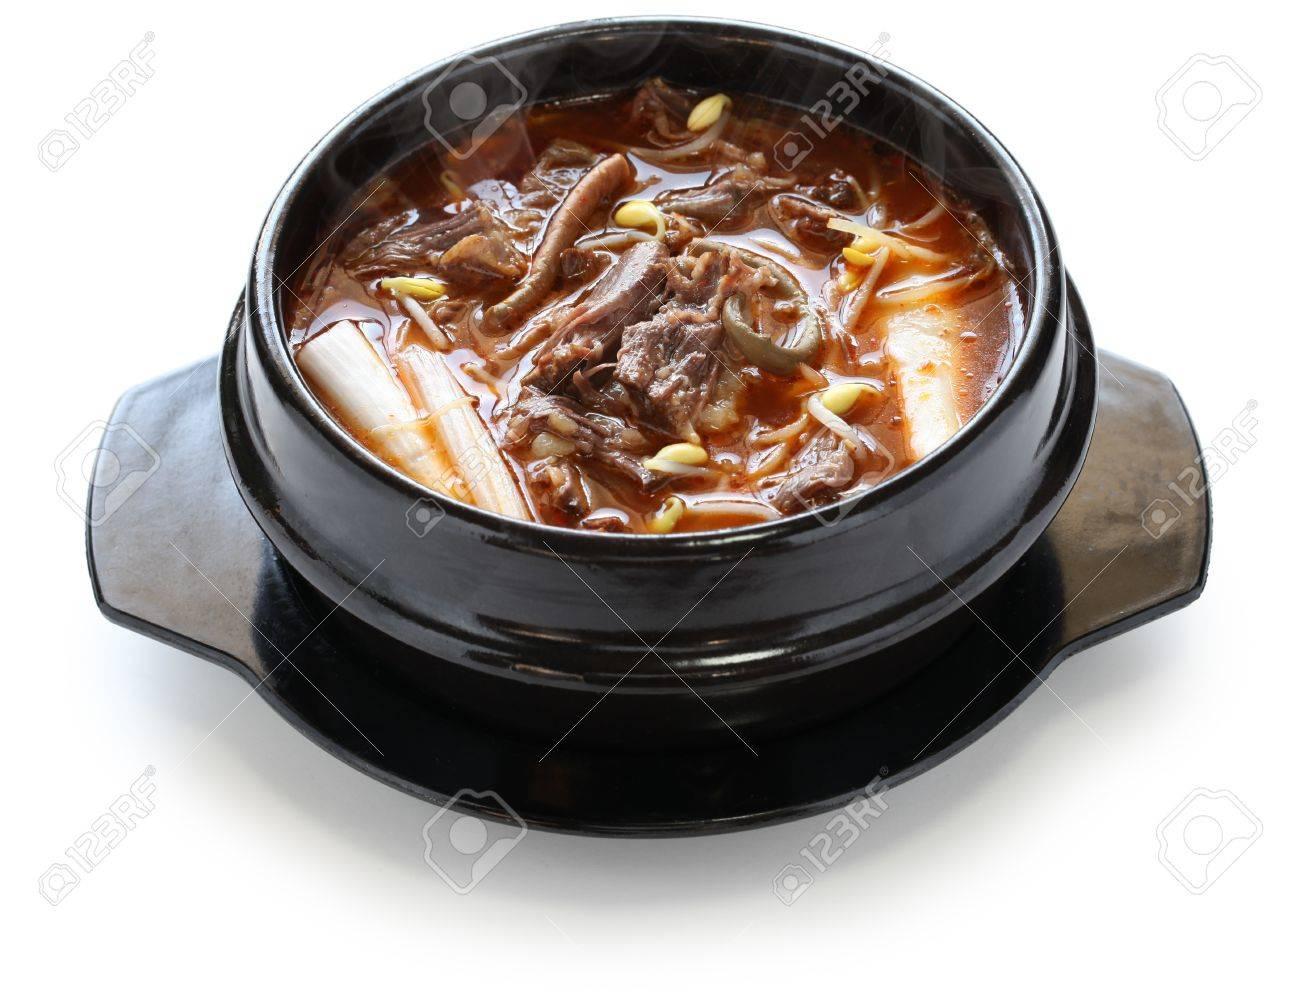 yukgaejang, spicy beef and vegetable soup, korean food Stock Photo - 17504820